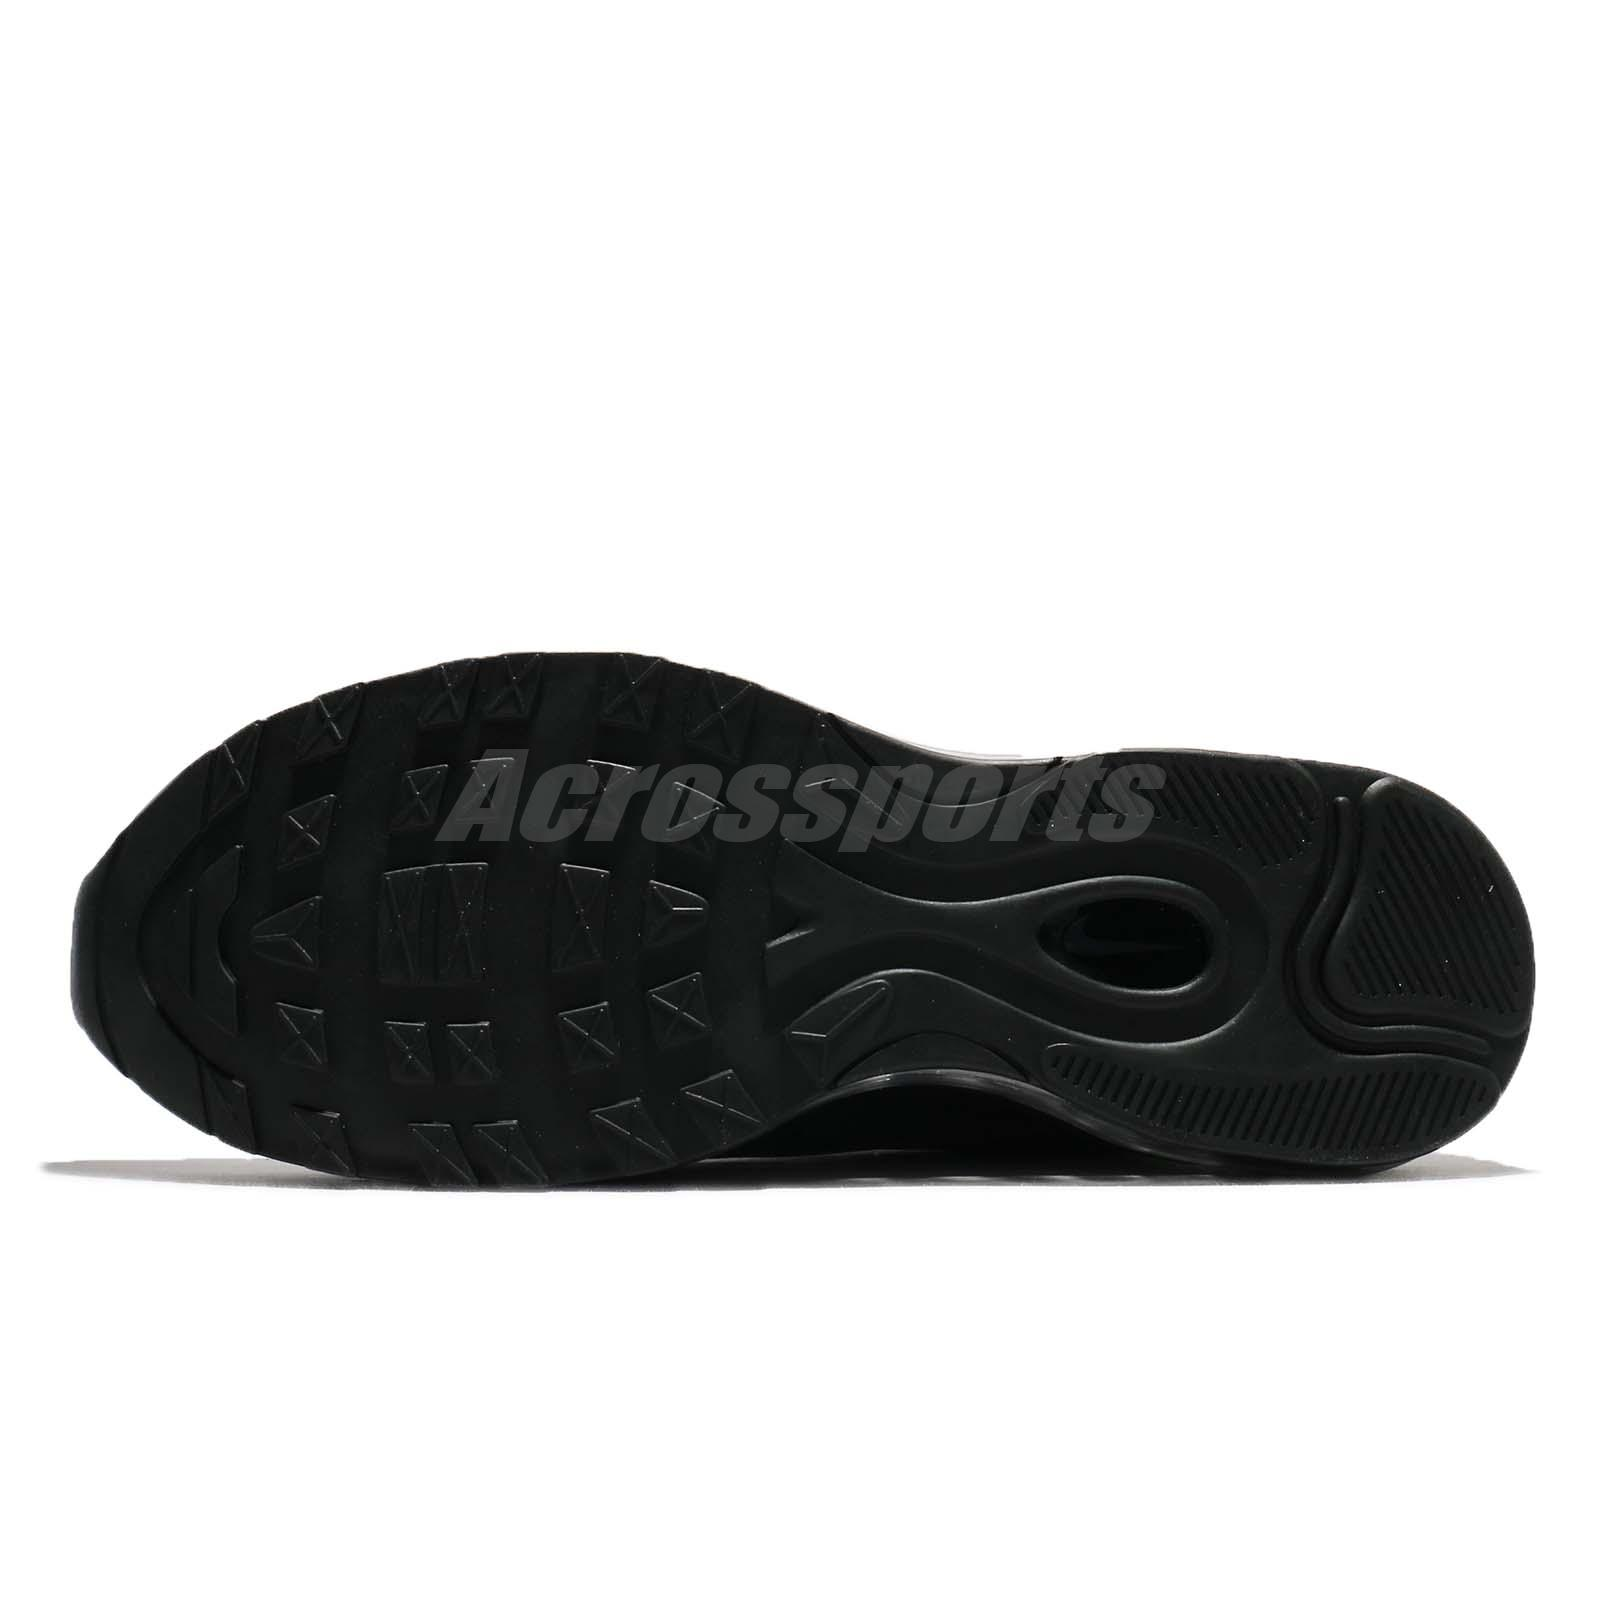 Nike Air Max 97 Ultra '17 Premium Black & Antrasitt Kapital 8dgpeZI